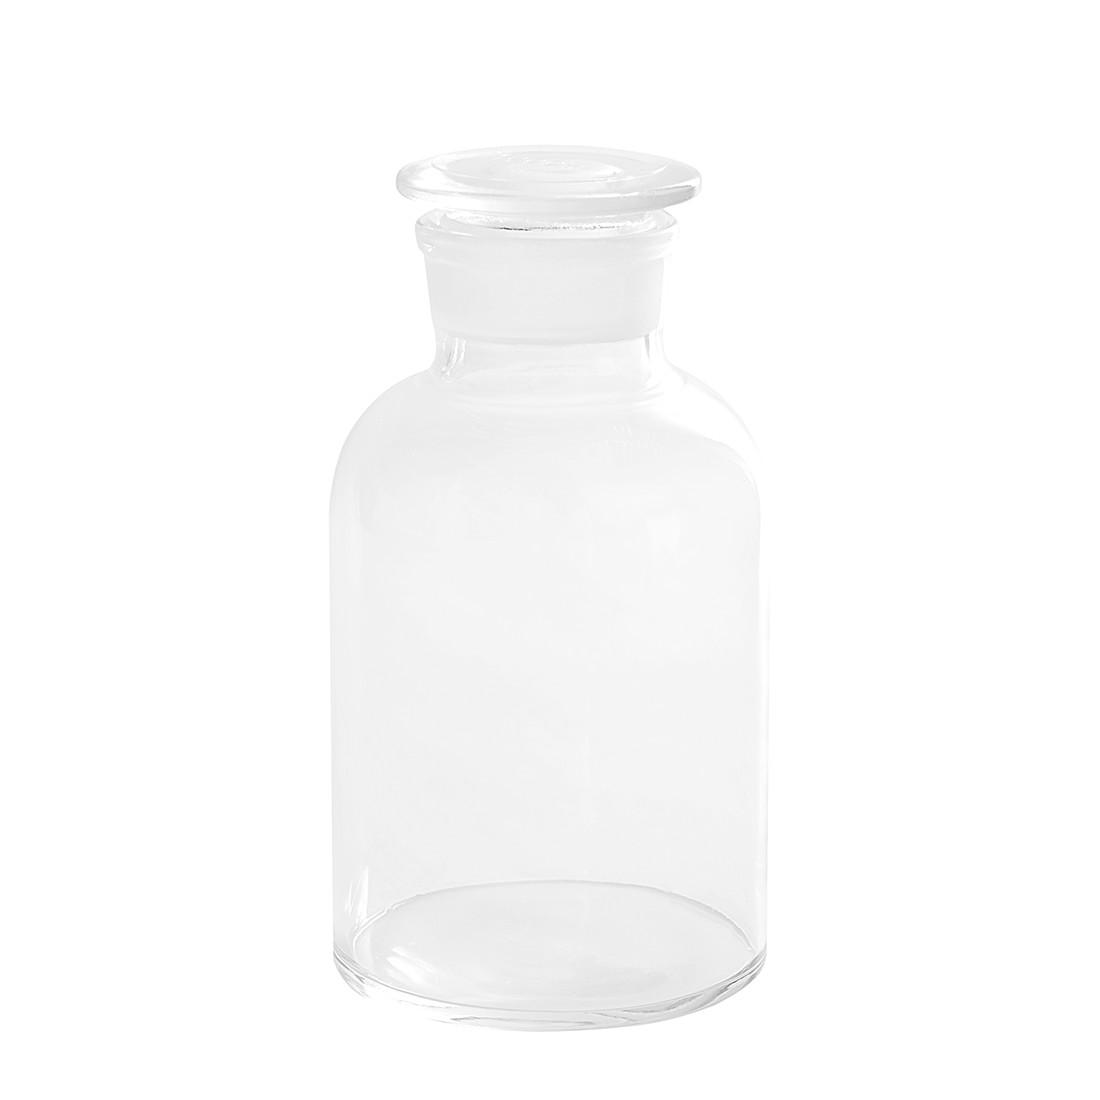 Apothekerglas Antik (2er-Set), Serax online bestellen